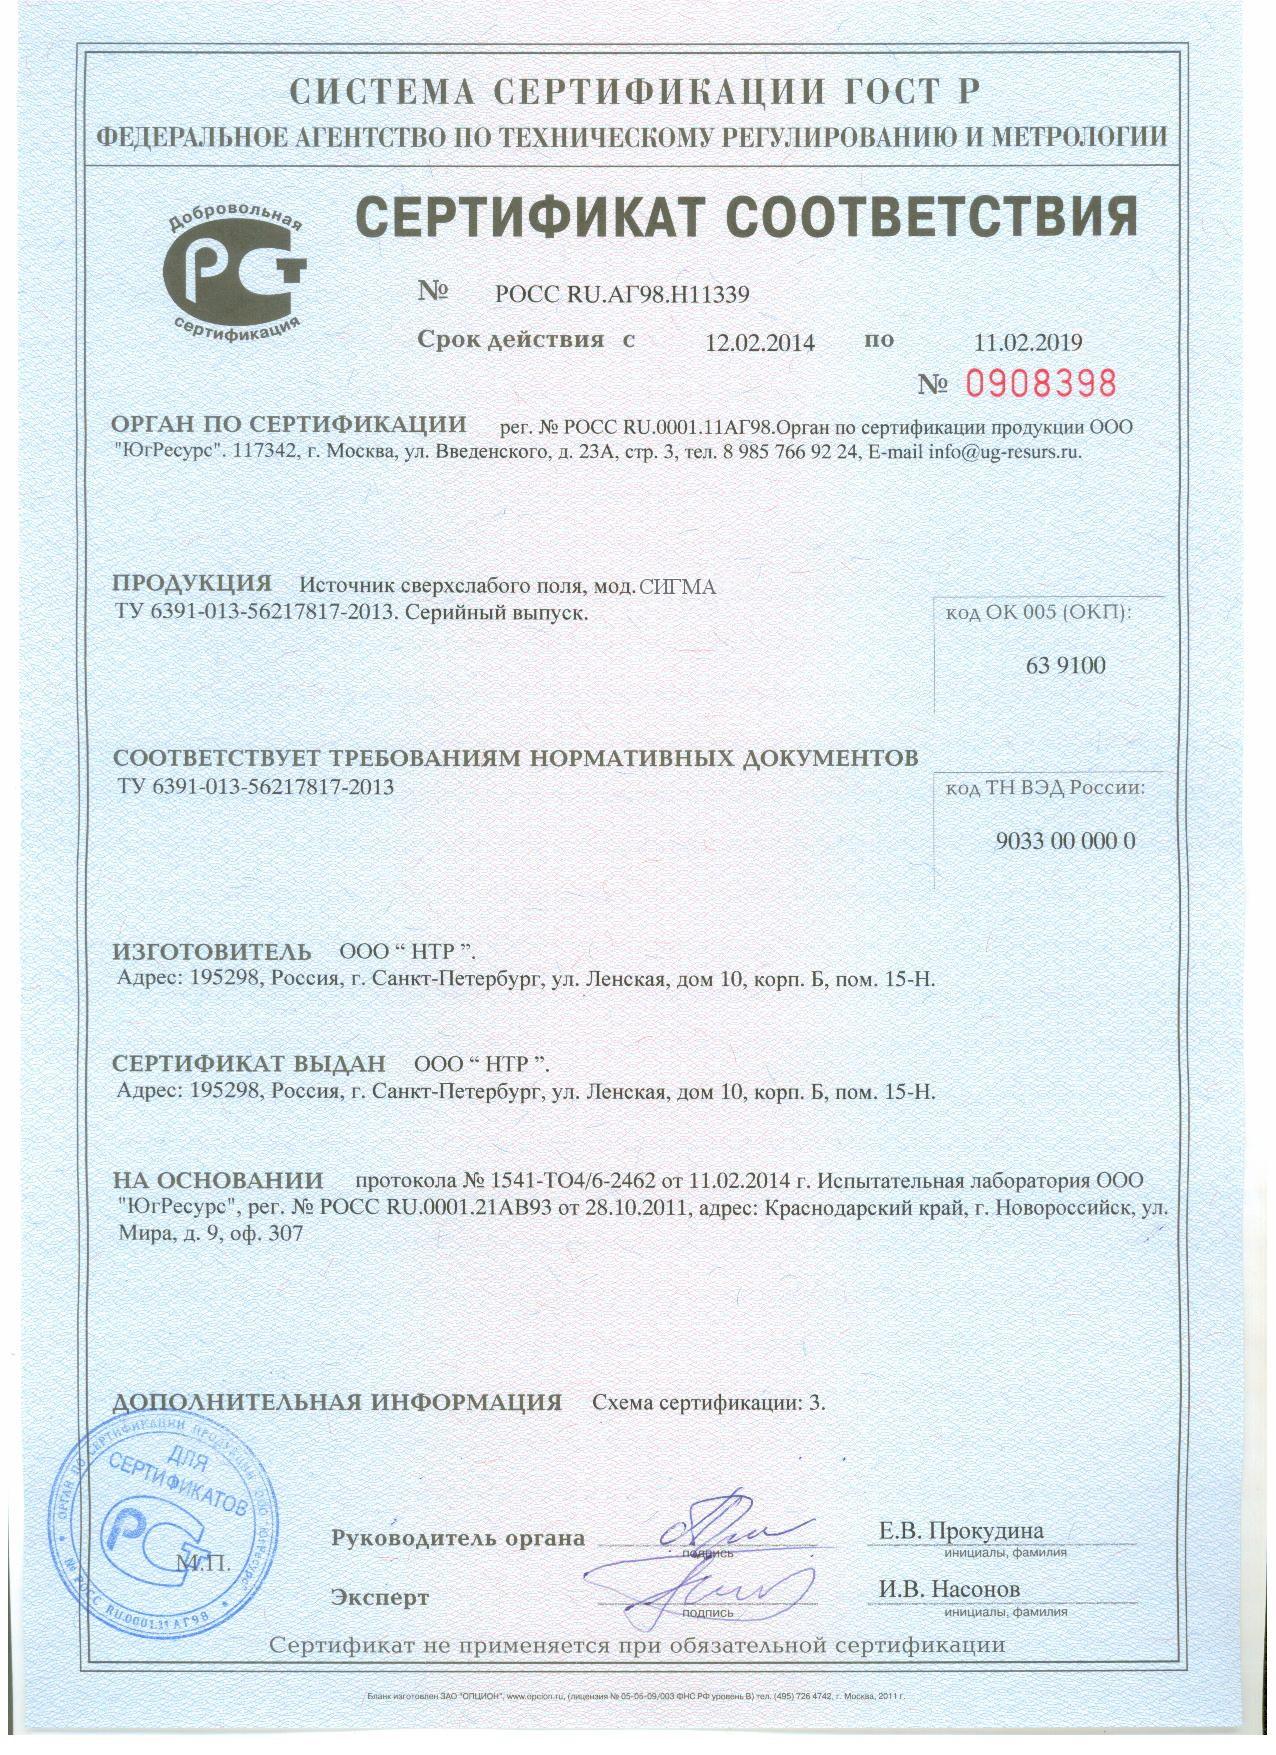 Сертификат на пластины с наногенератором СЭМП